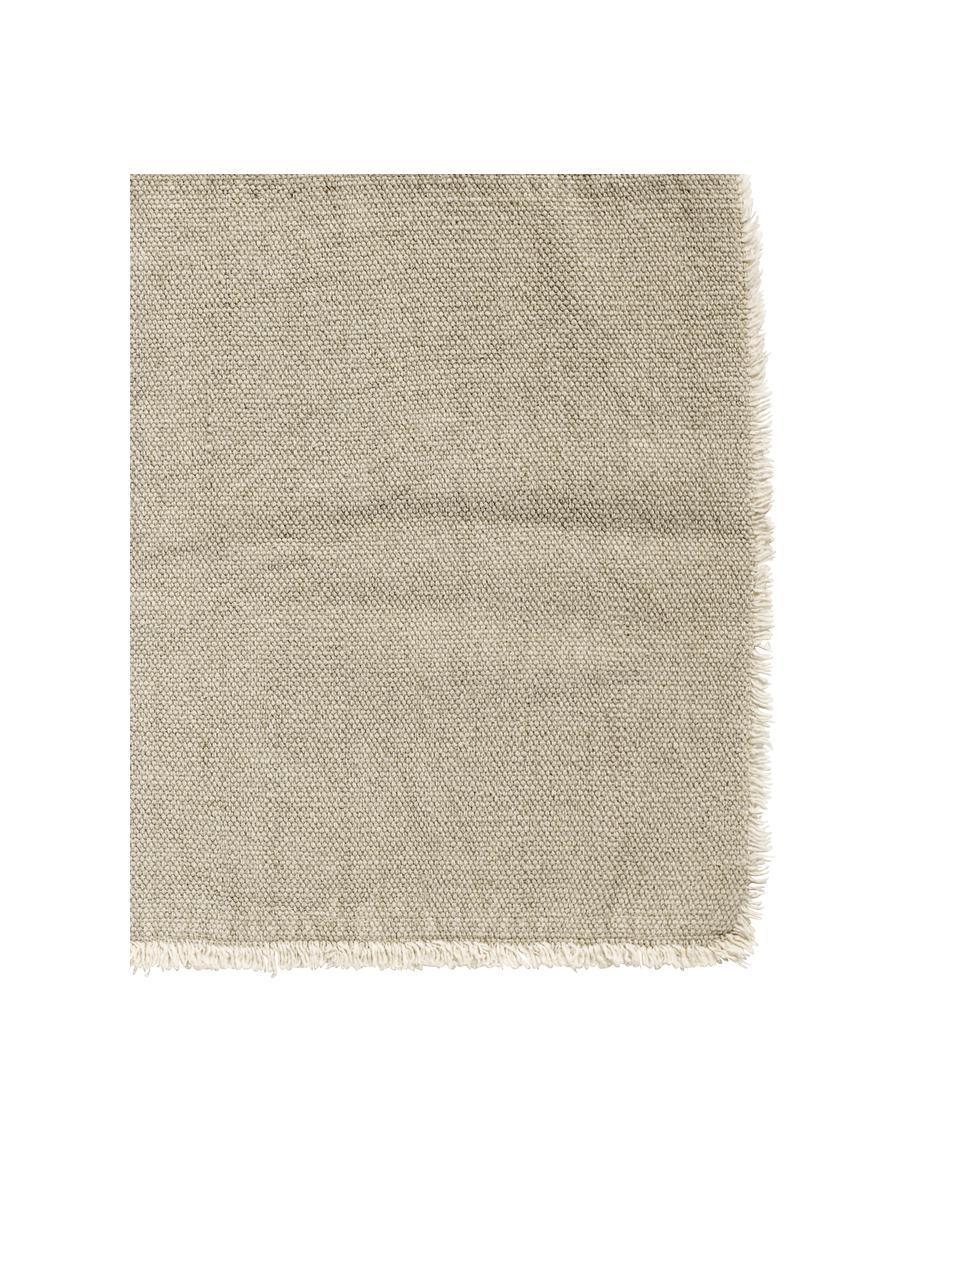 Tovaglietta americana Edge 6 pz, Misto cotone, stonewashed, Greige, Larg. 33 x Lung. 48 cm